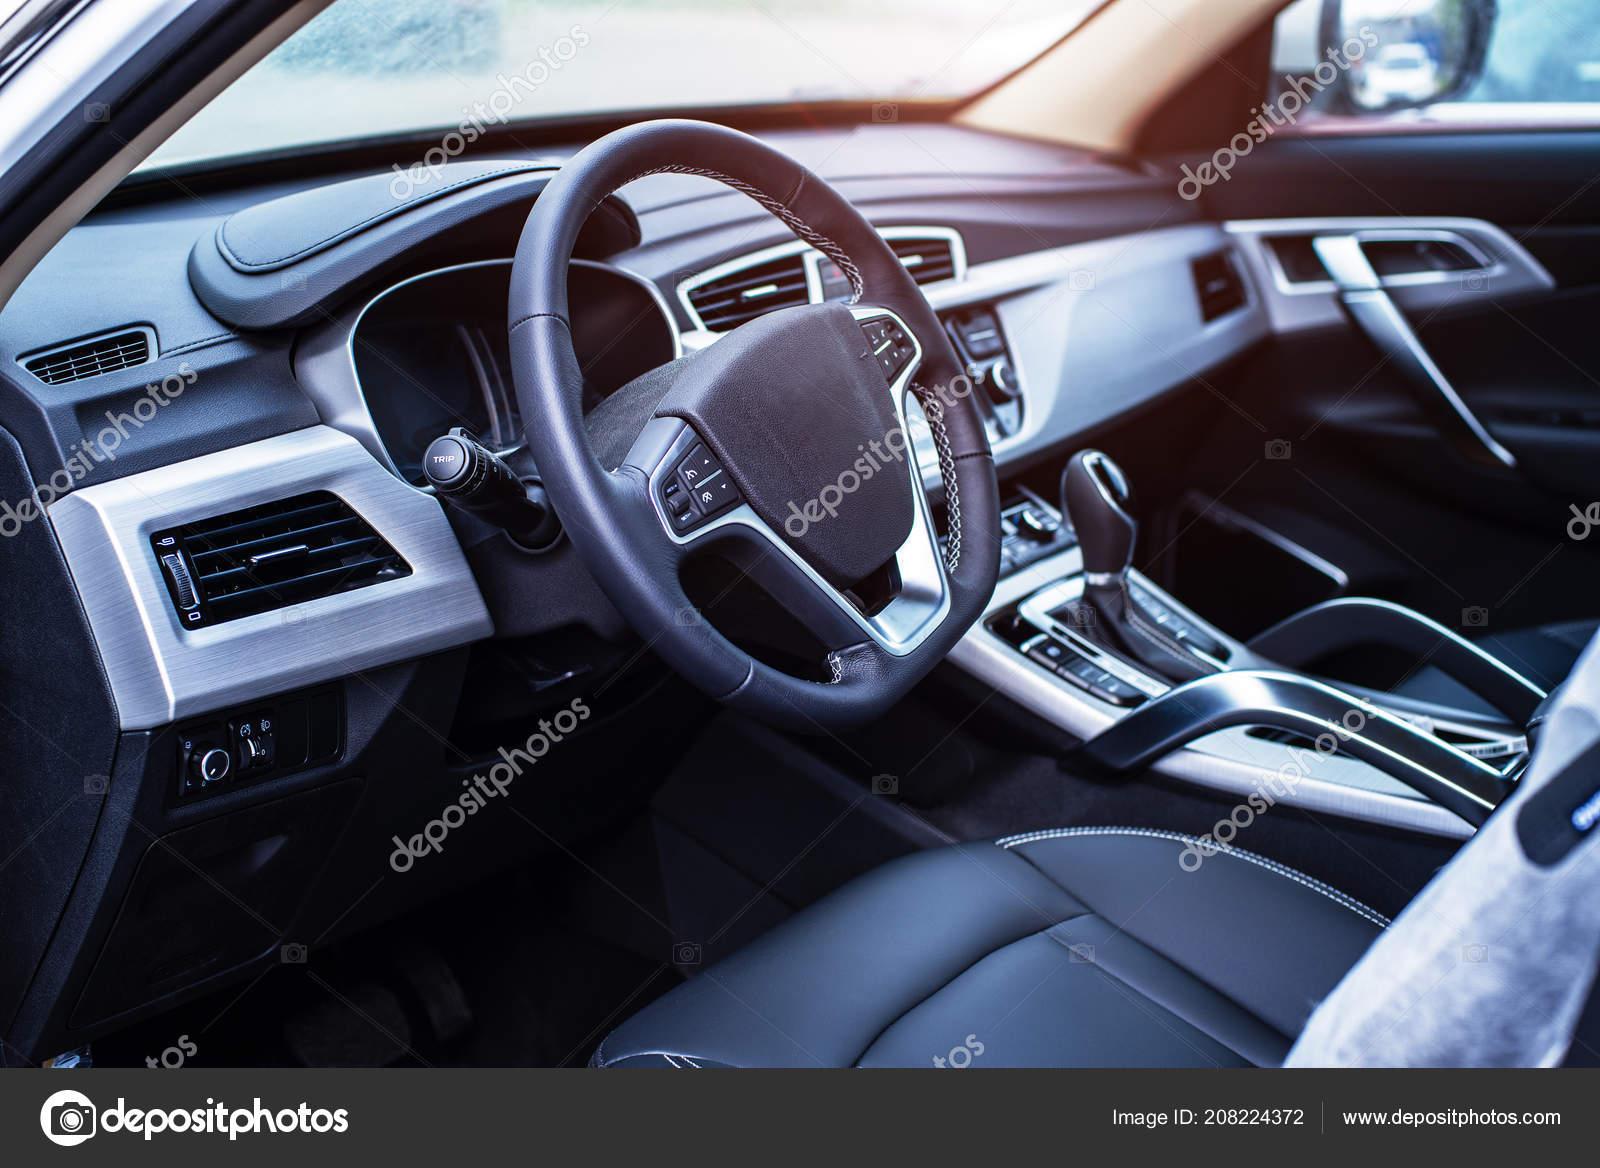 2720e51aed εσωτερικό αυτοκινήτου με ρηχό βάθος πεδίου — Φωτογραφία Αρχείου ...